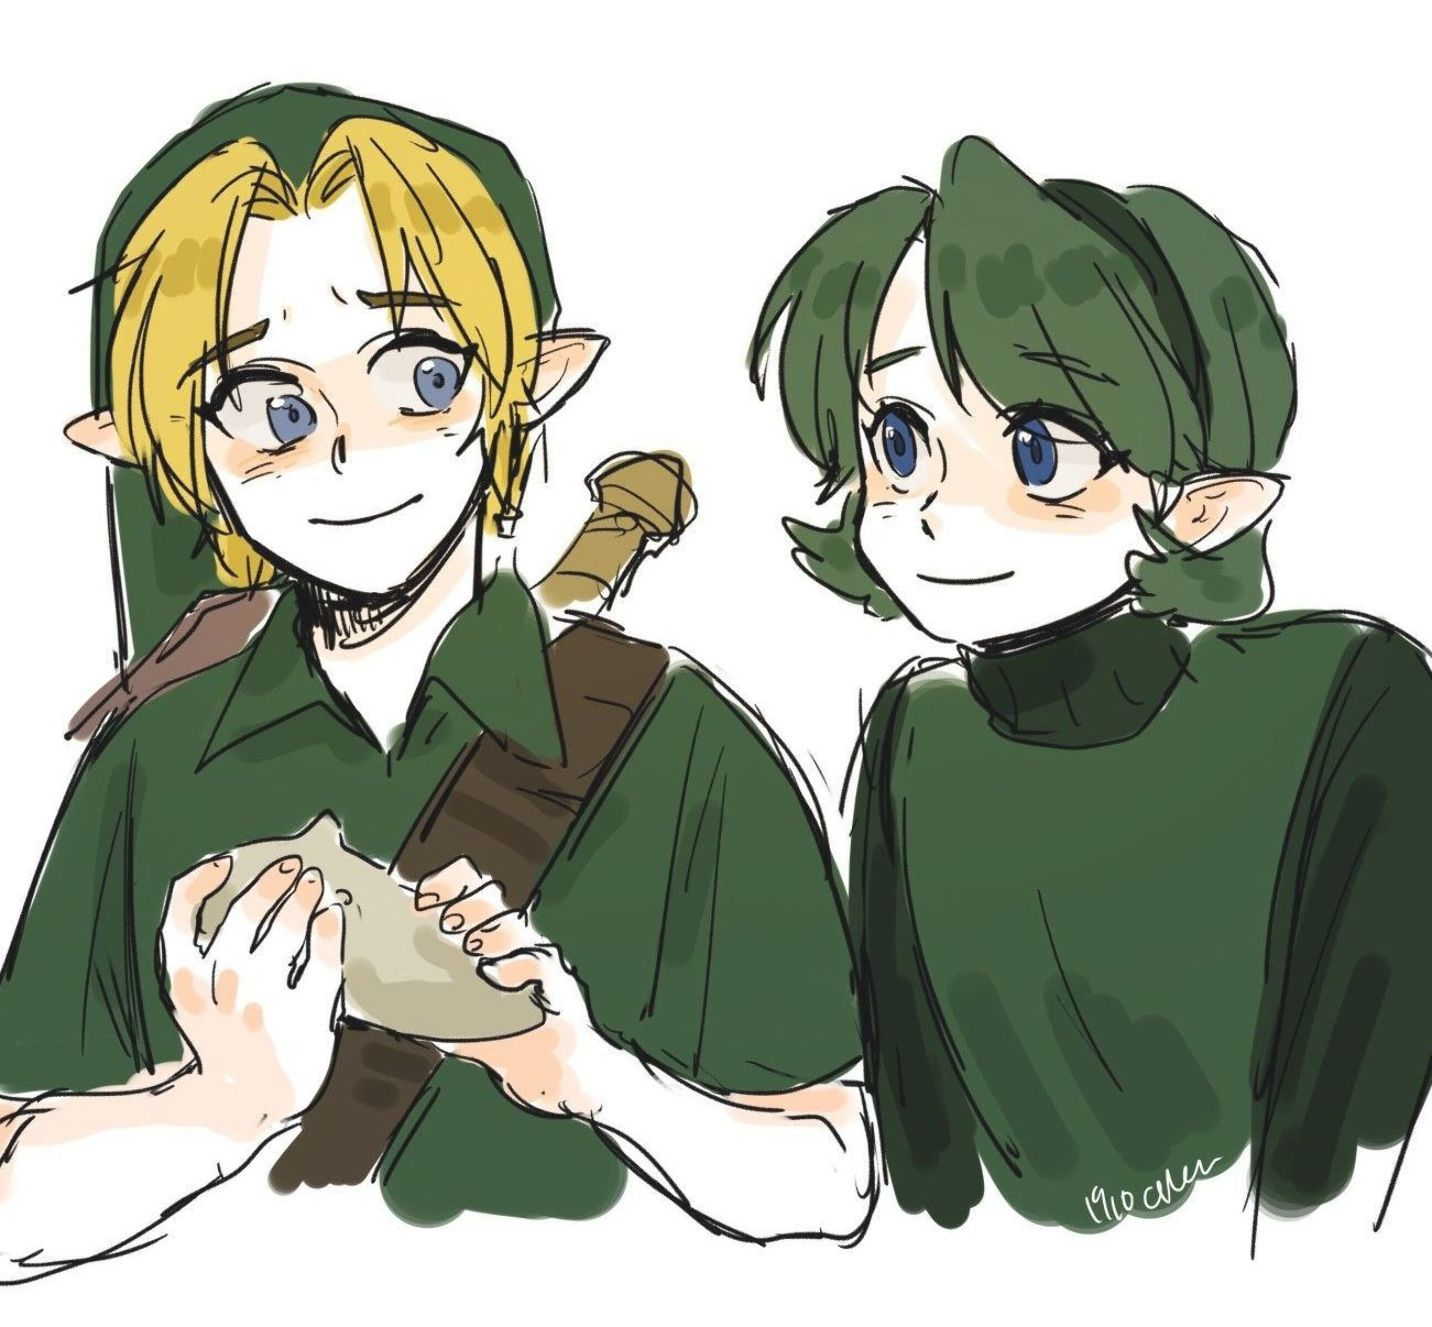 Legend Of Zelda Ocarina Of Time Art Link And Saria Sage Of Forest Kokiri Oot Himu Zelda Legend Of Zelda Ocarina Of Time Legend